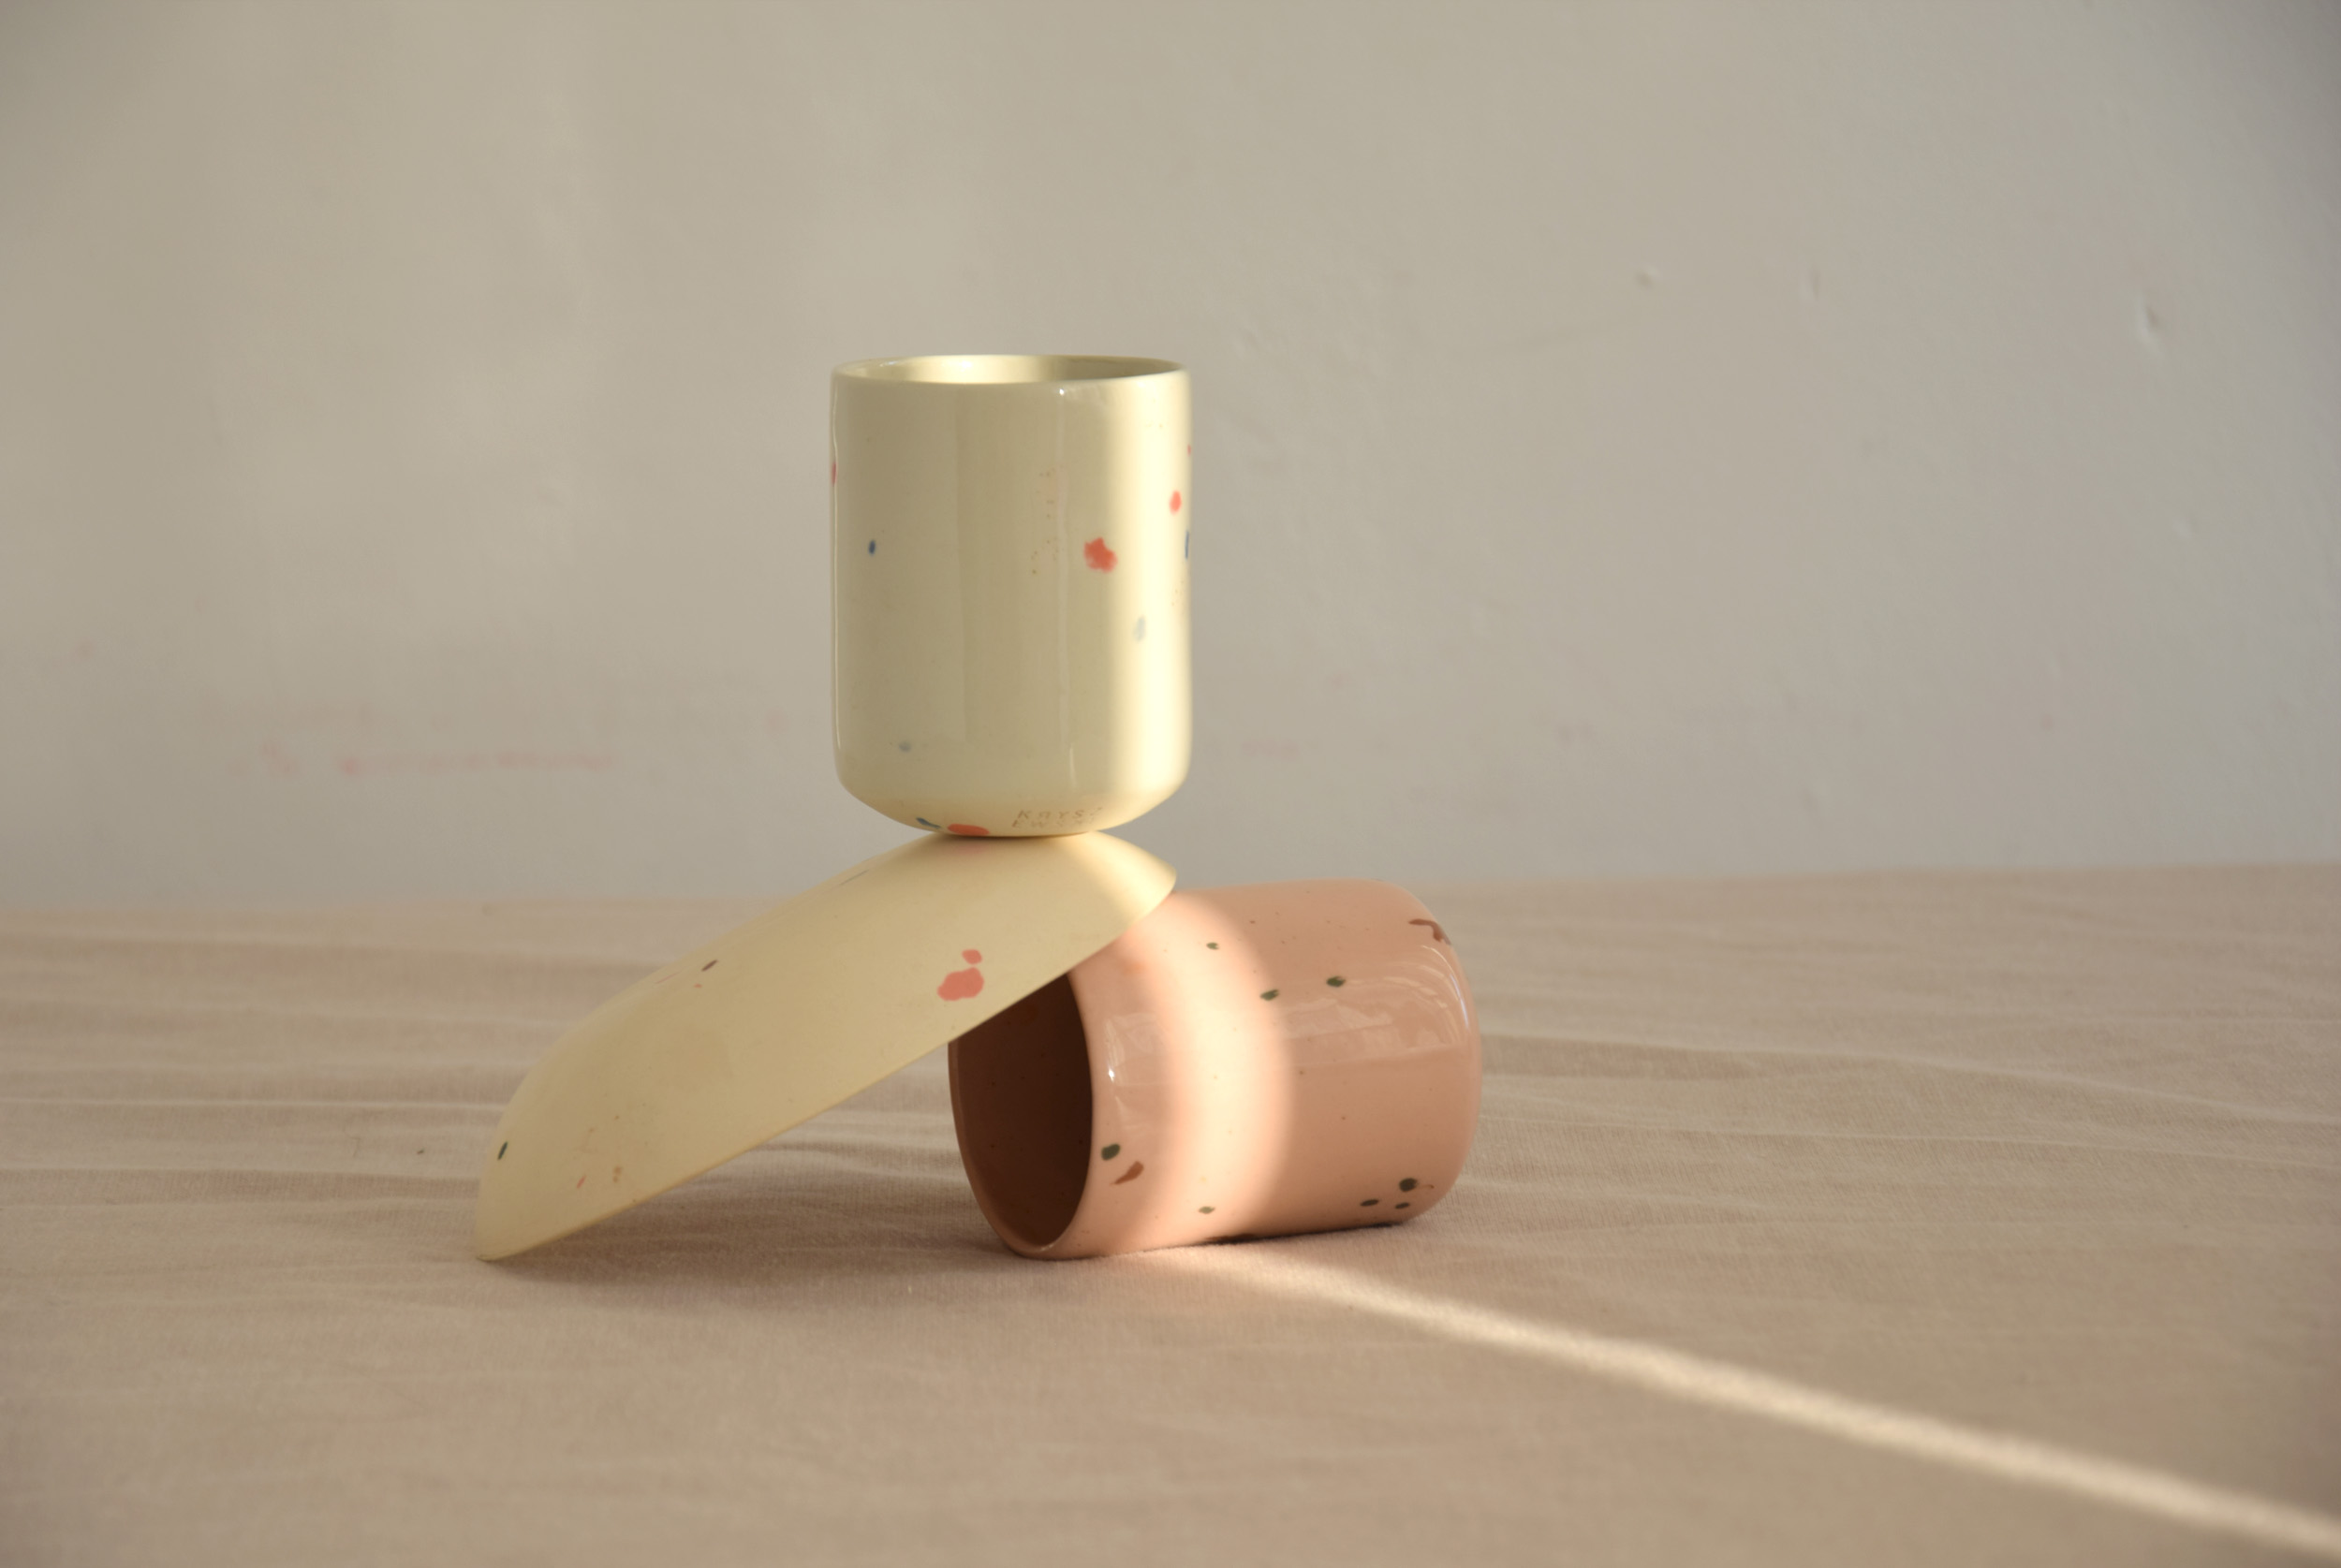 confetti2-studiokryszewski.jpg